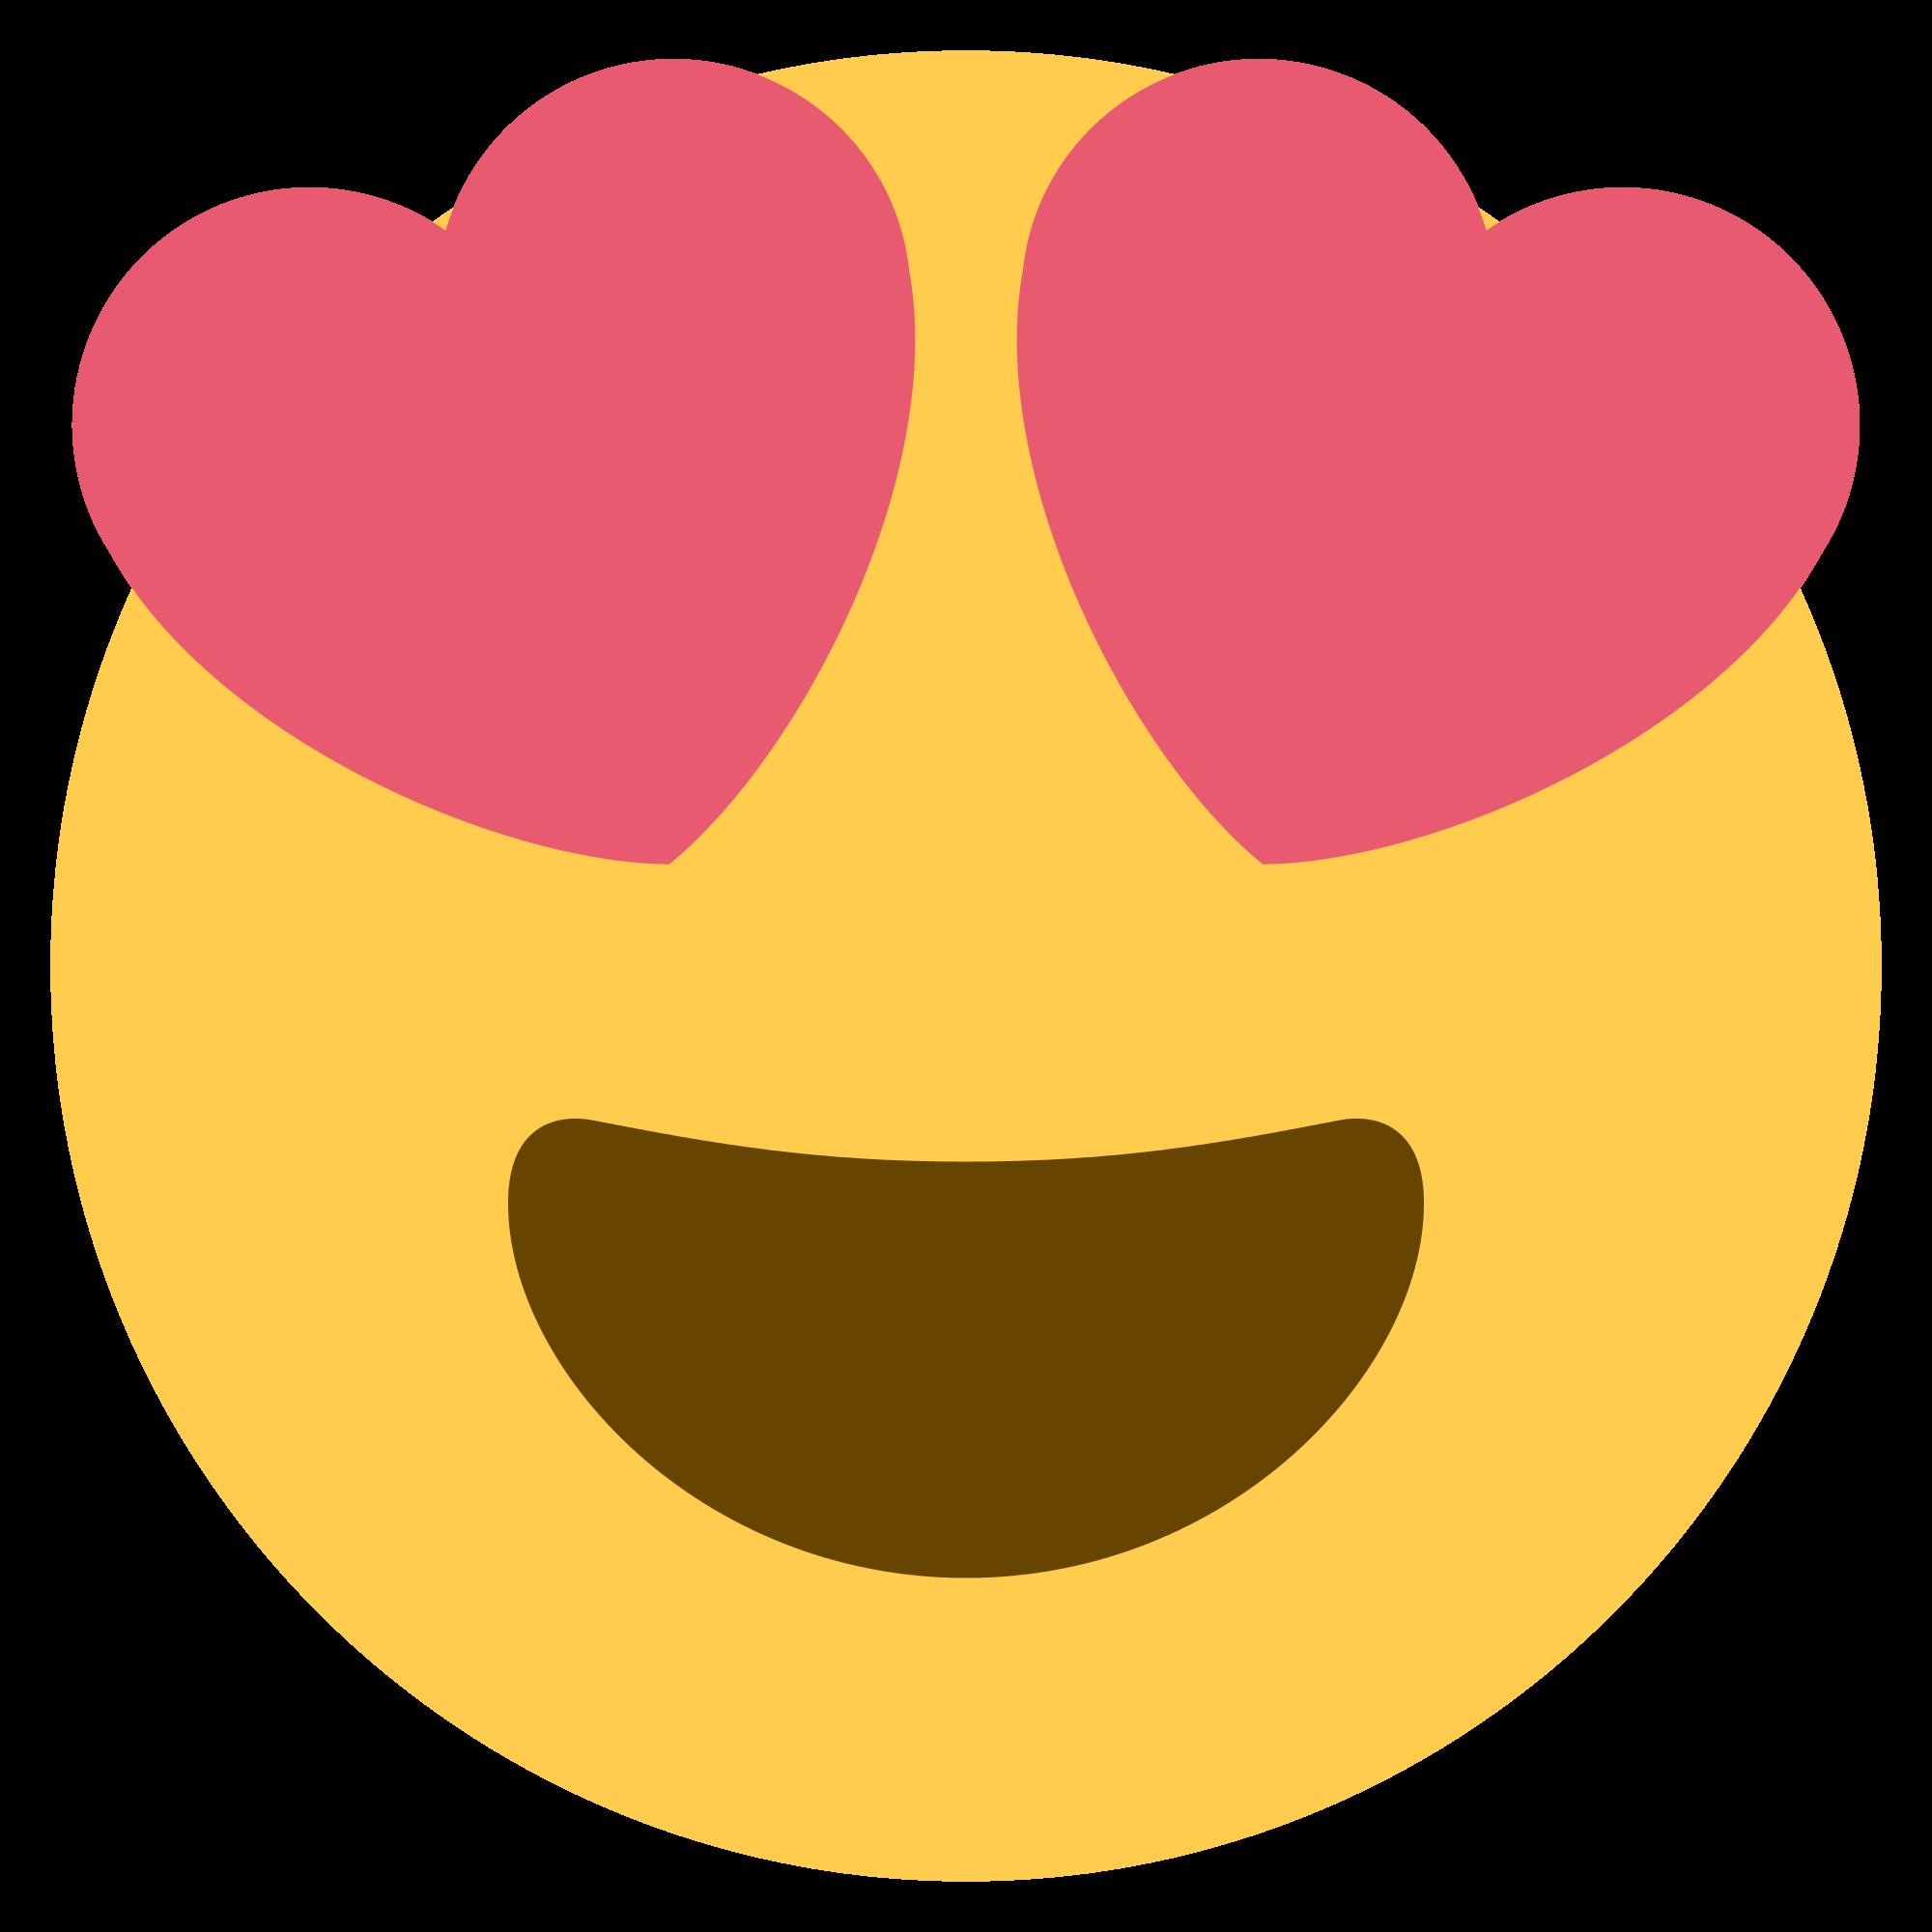 px twemoji f. Pawprint clipart emoji